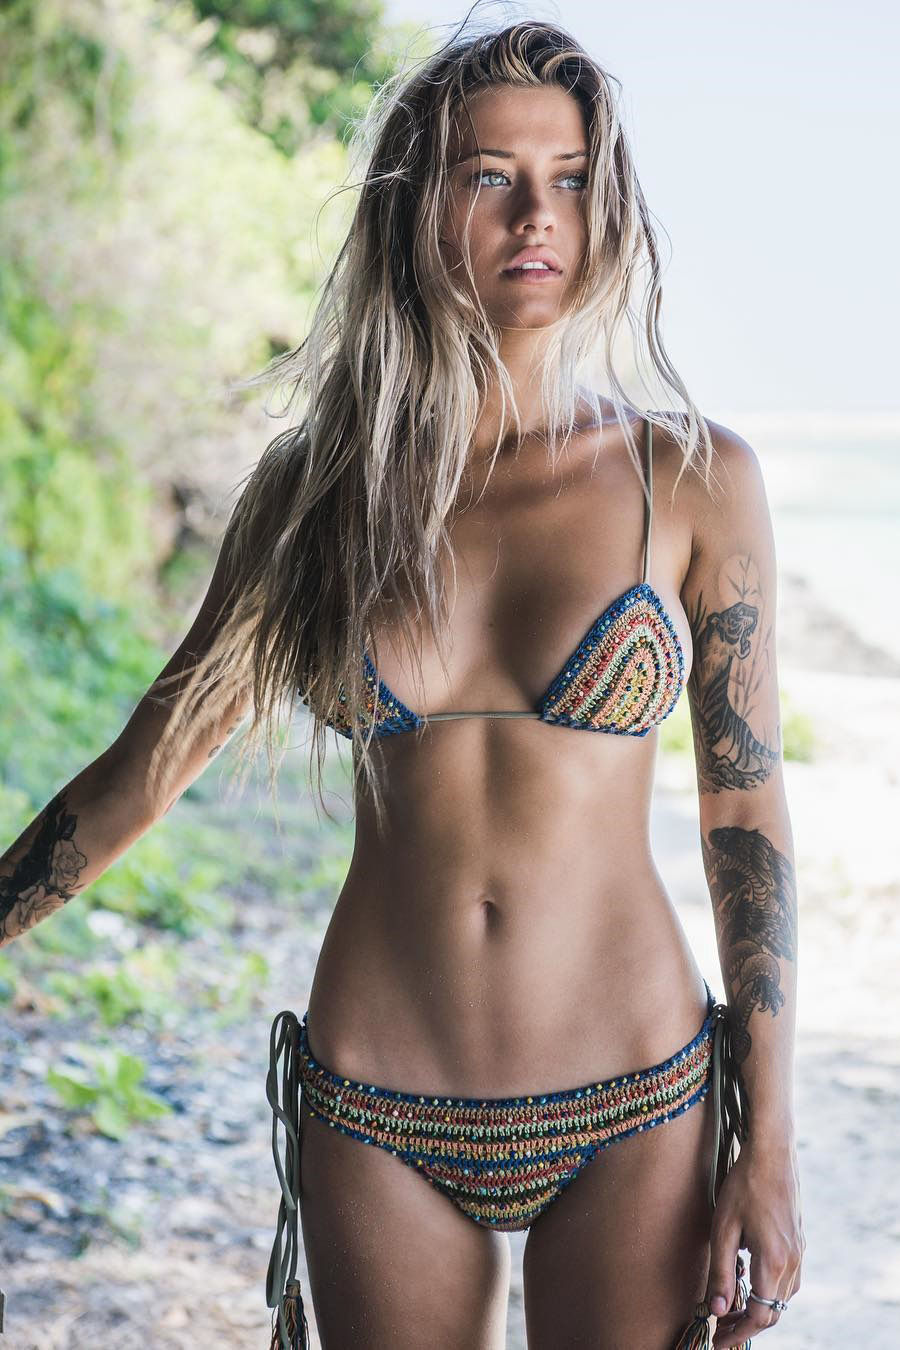 Nice swimsuit 😚😚😚